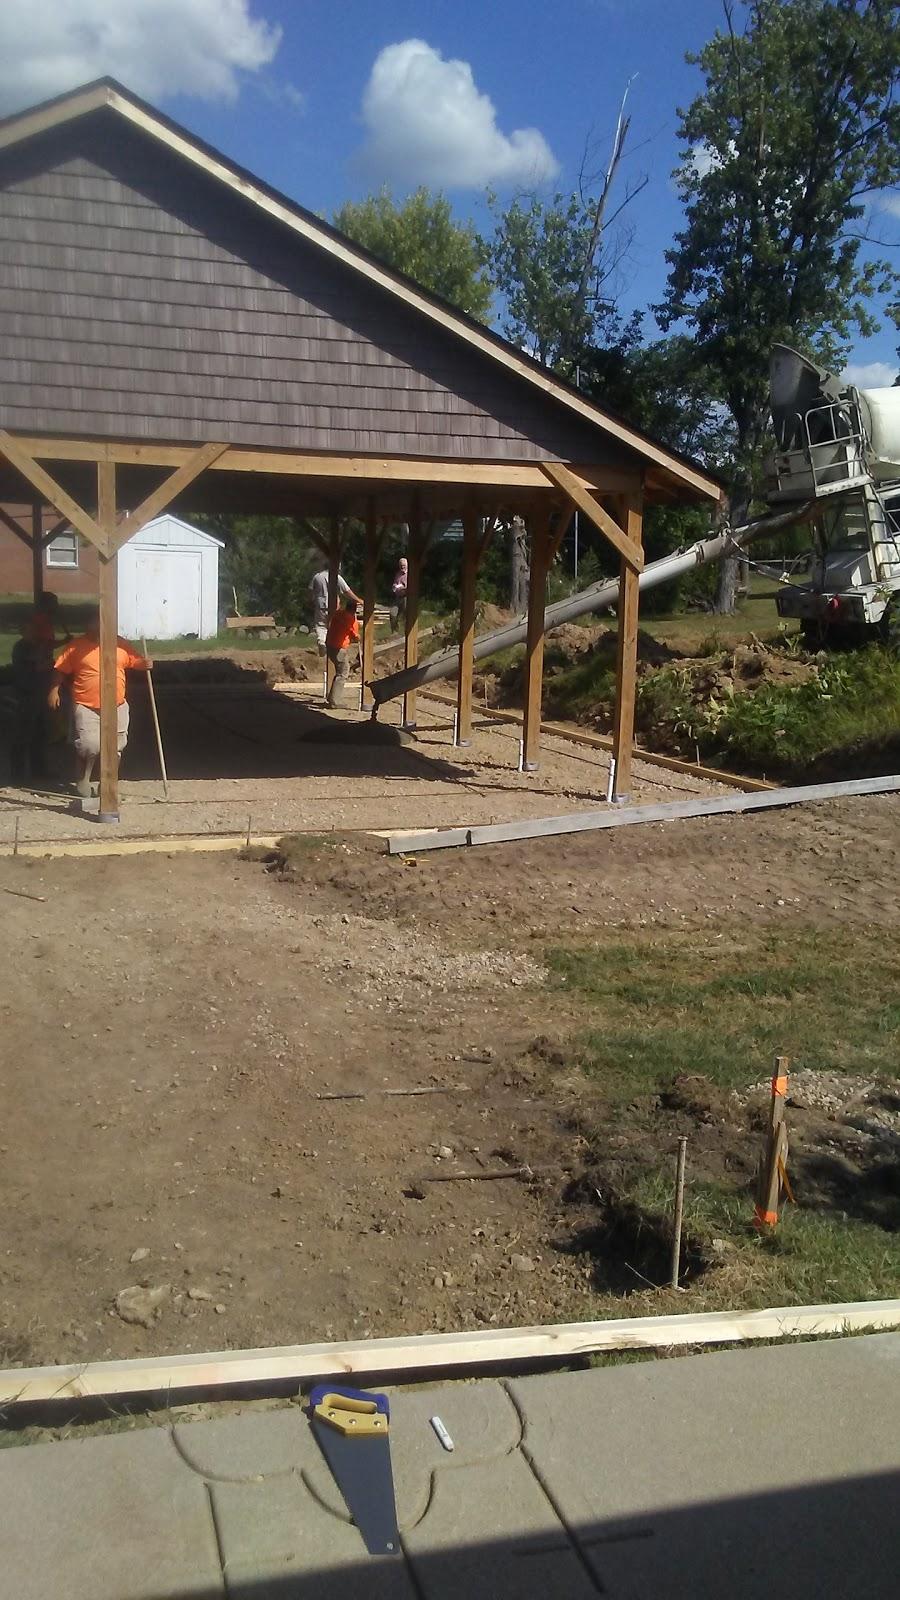 Timberhill Baptist Church - church  | Photo 1 of 10 | Address: 144 Timber Hill Dr, Hamilton, OH 45013, USA | Phone: (513) 863-0868